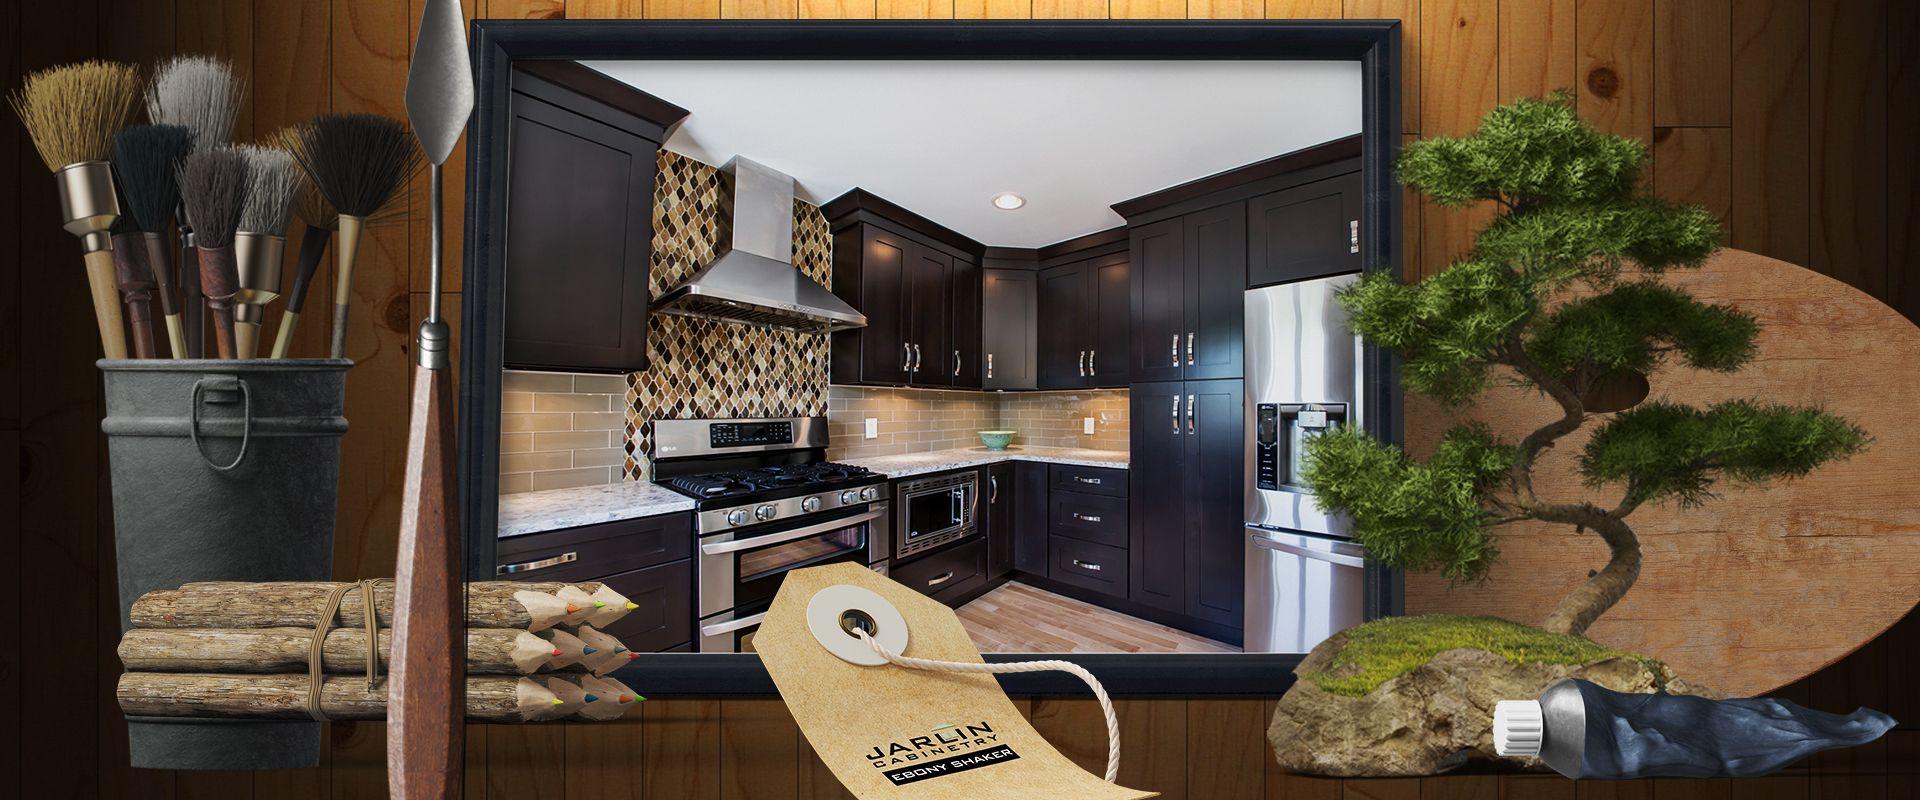 Best Jarlin Cabinetry Ebony Shaker Espresso Cabinets Espresso 400 x 300